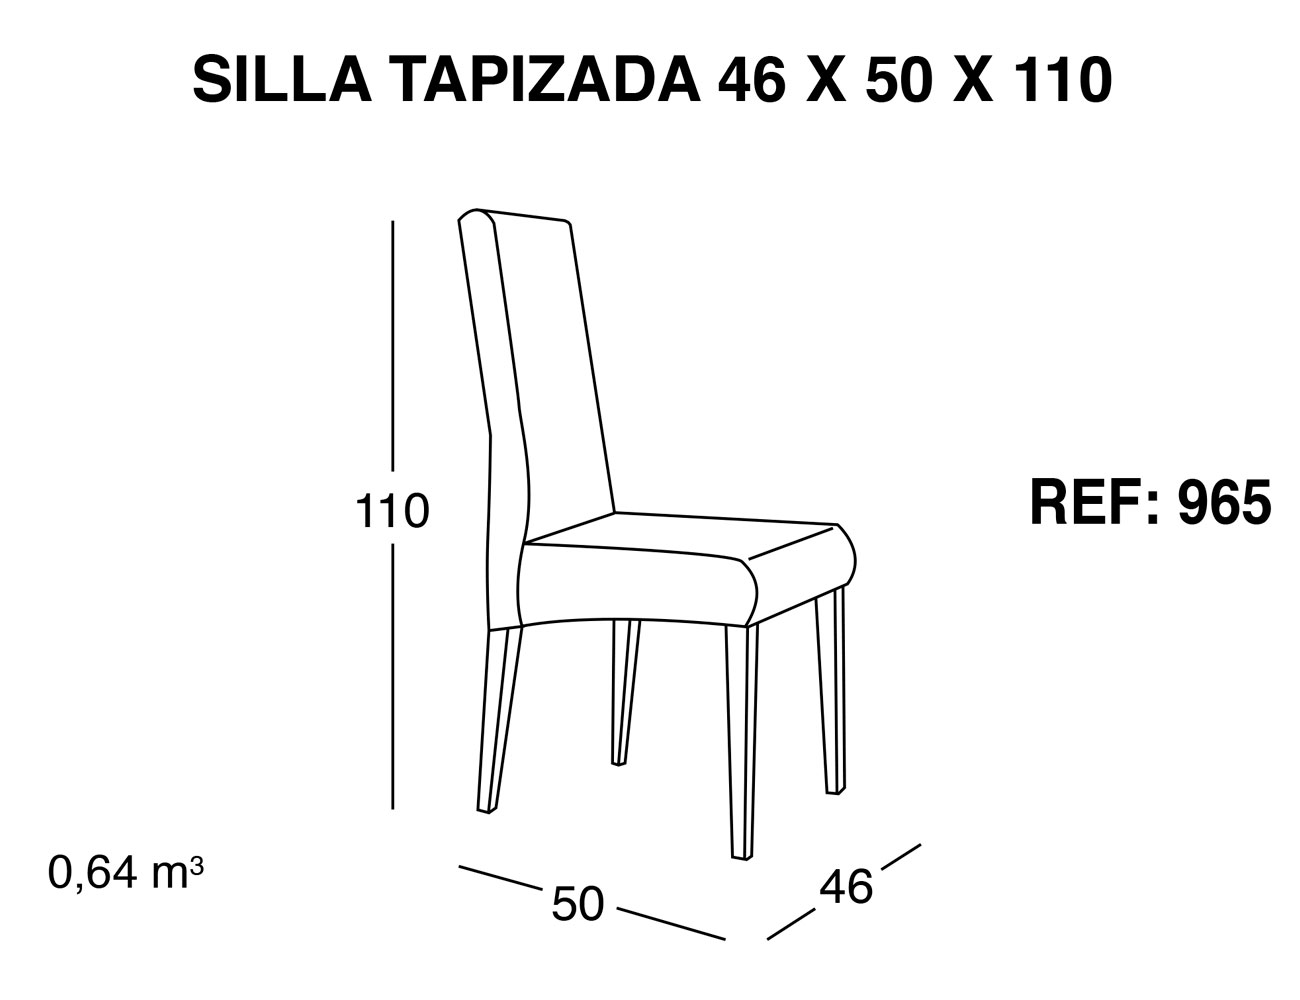 Silla tapizada 46 50 10